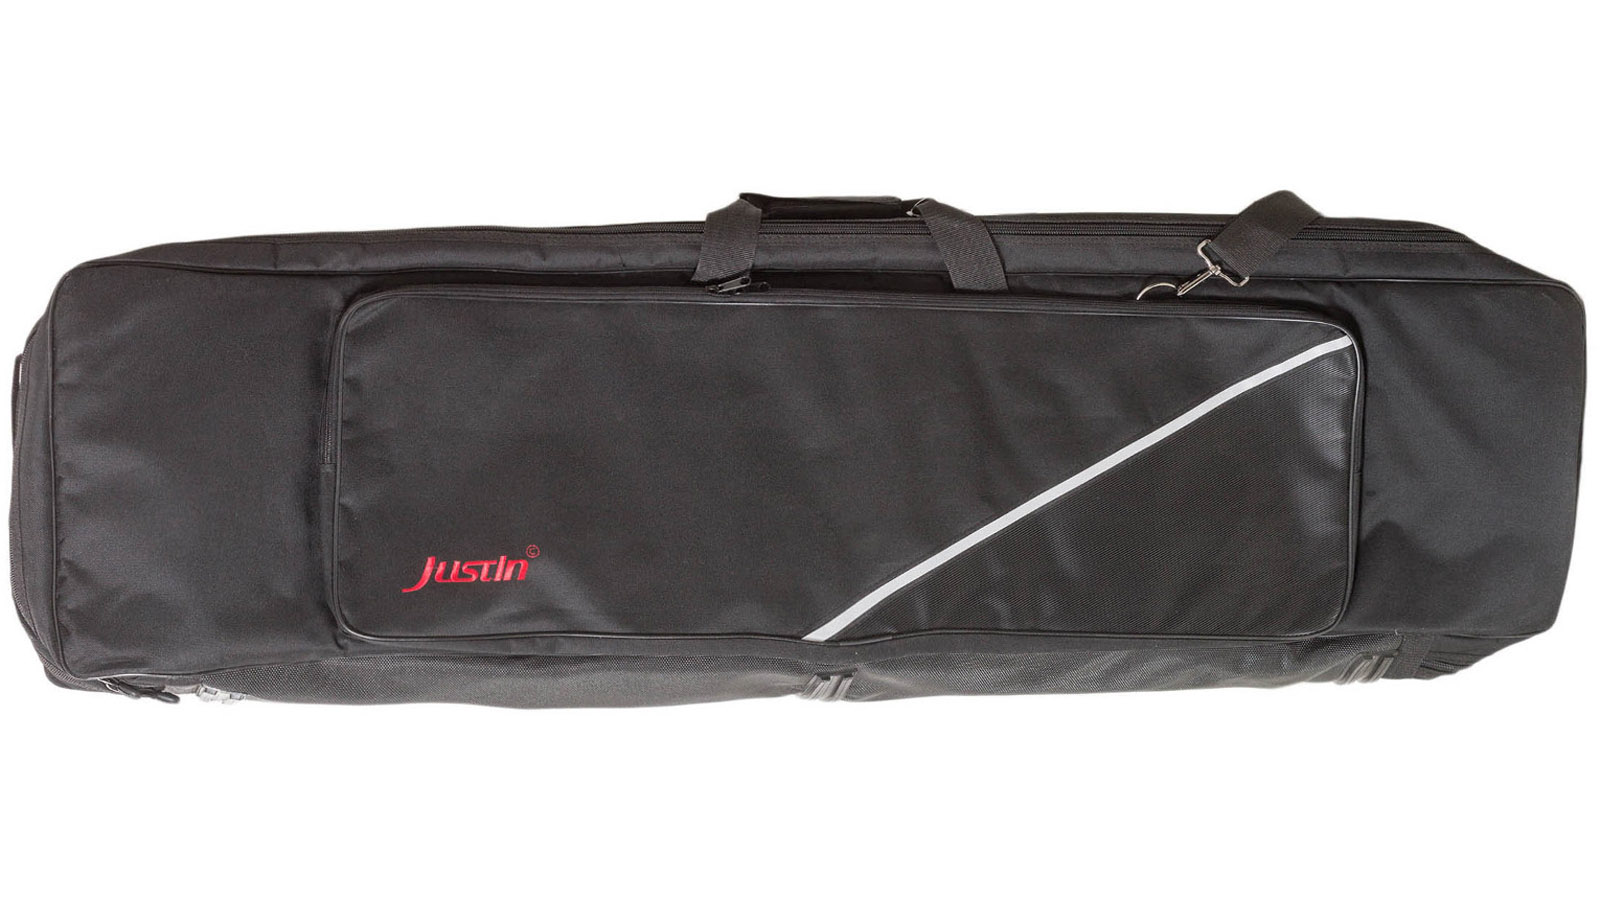 Justin TB 137 Keyboardtasche schwarz 137x37x17cm